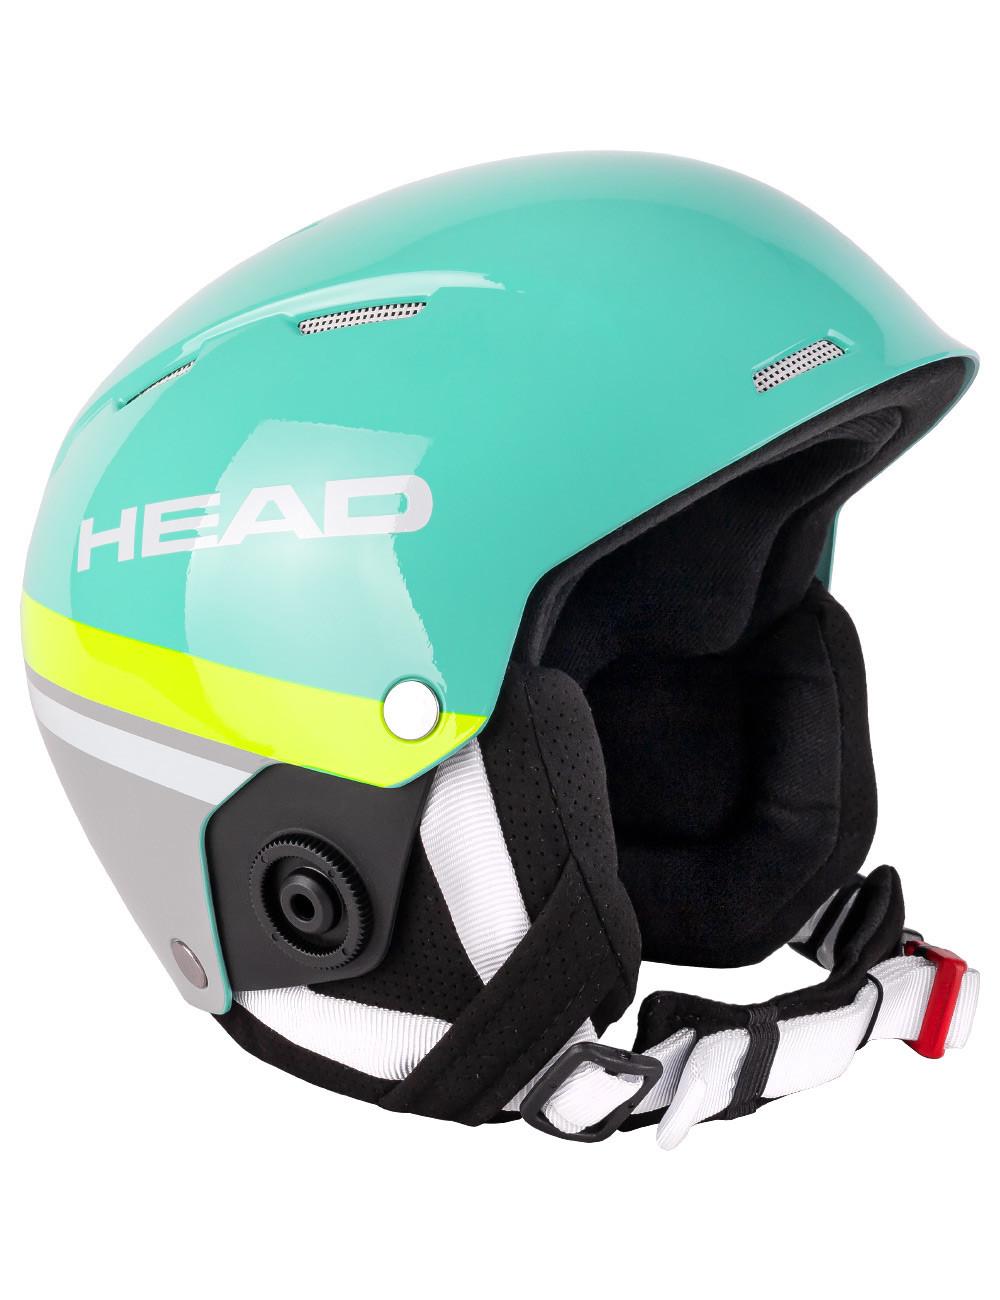 Kask narciarski Head TEAM SL